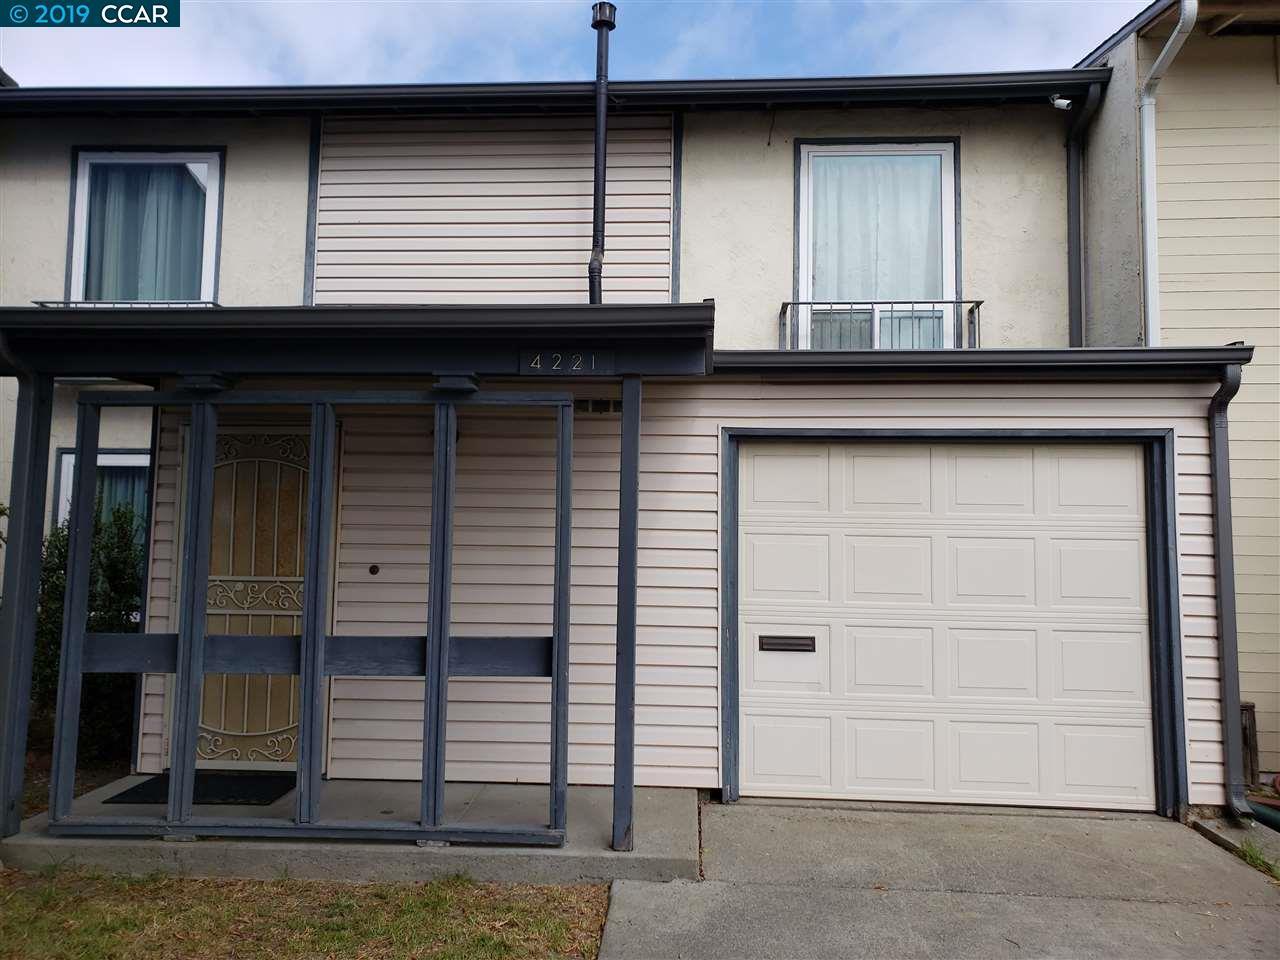 4221 OVEREND AVE, RICHMOND, CA 94804